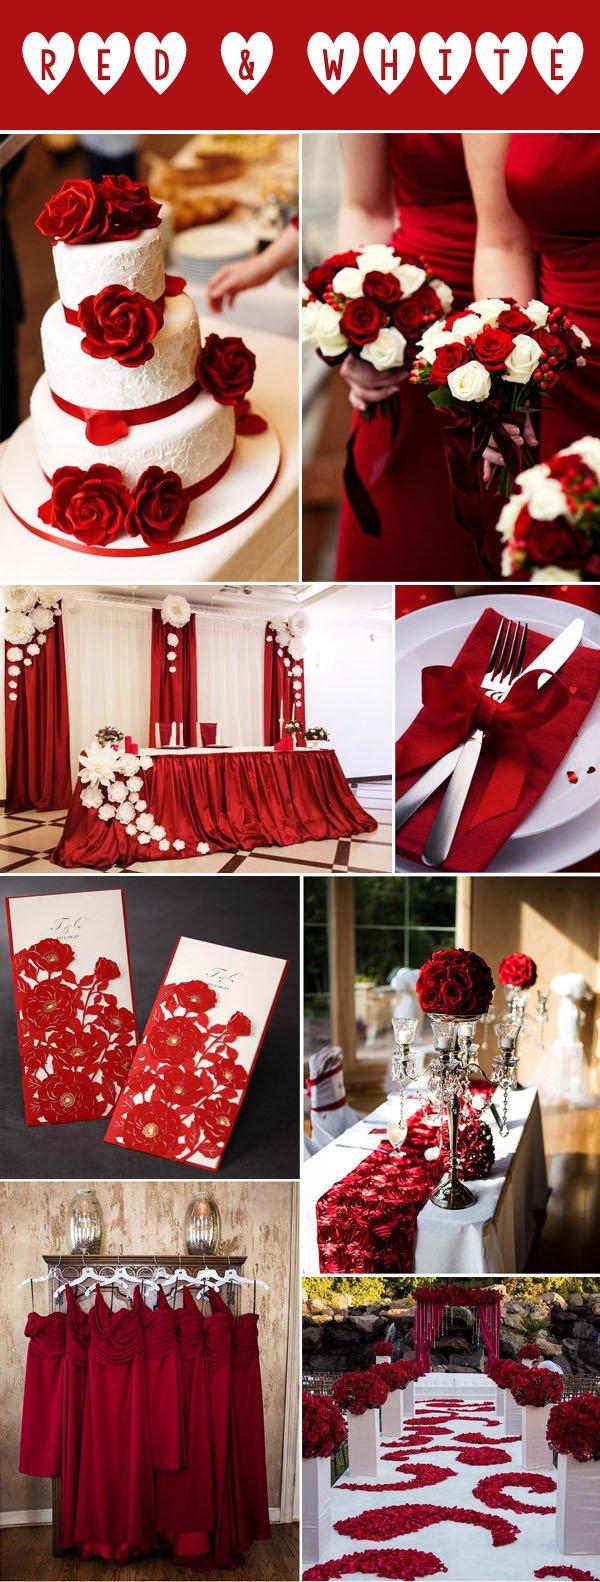 Wedding Decor Red and White Elegant 40 Inspirational Classic Red and White Wedding Ideas – Elegantweddinginvites Blog